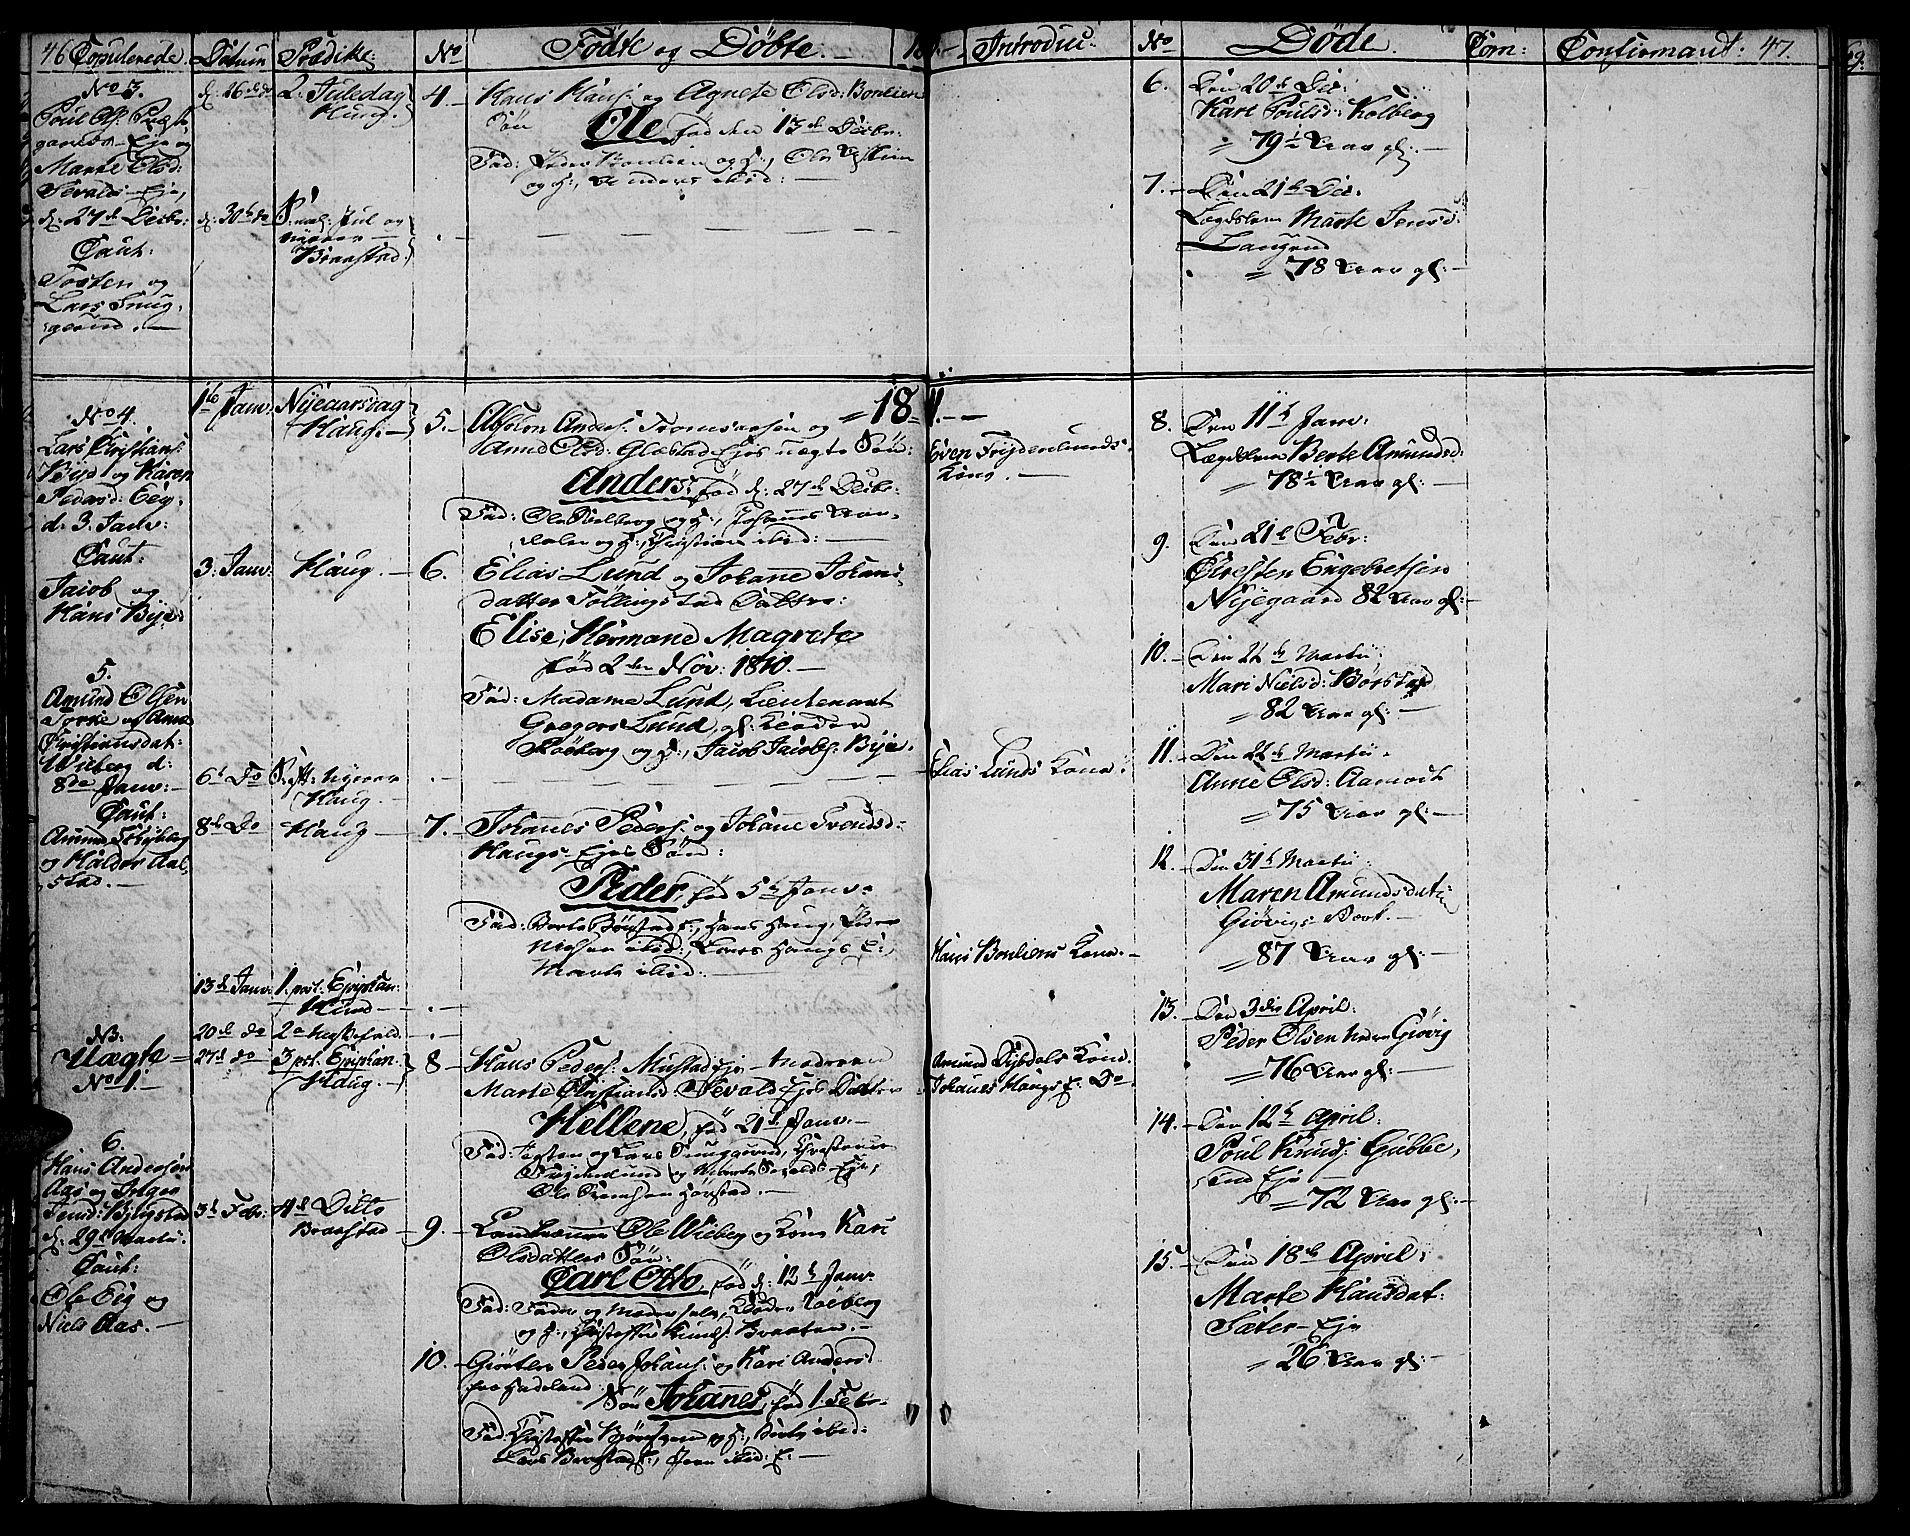 SAH, Vardal prestekontor, H/Ha/Haa/L0003: Ministerialbok nr. 3, 1808-1814, s. 46-47